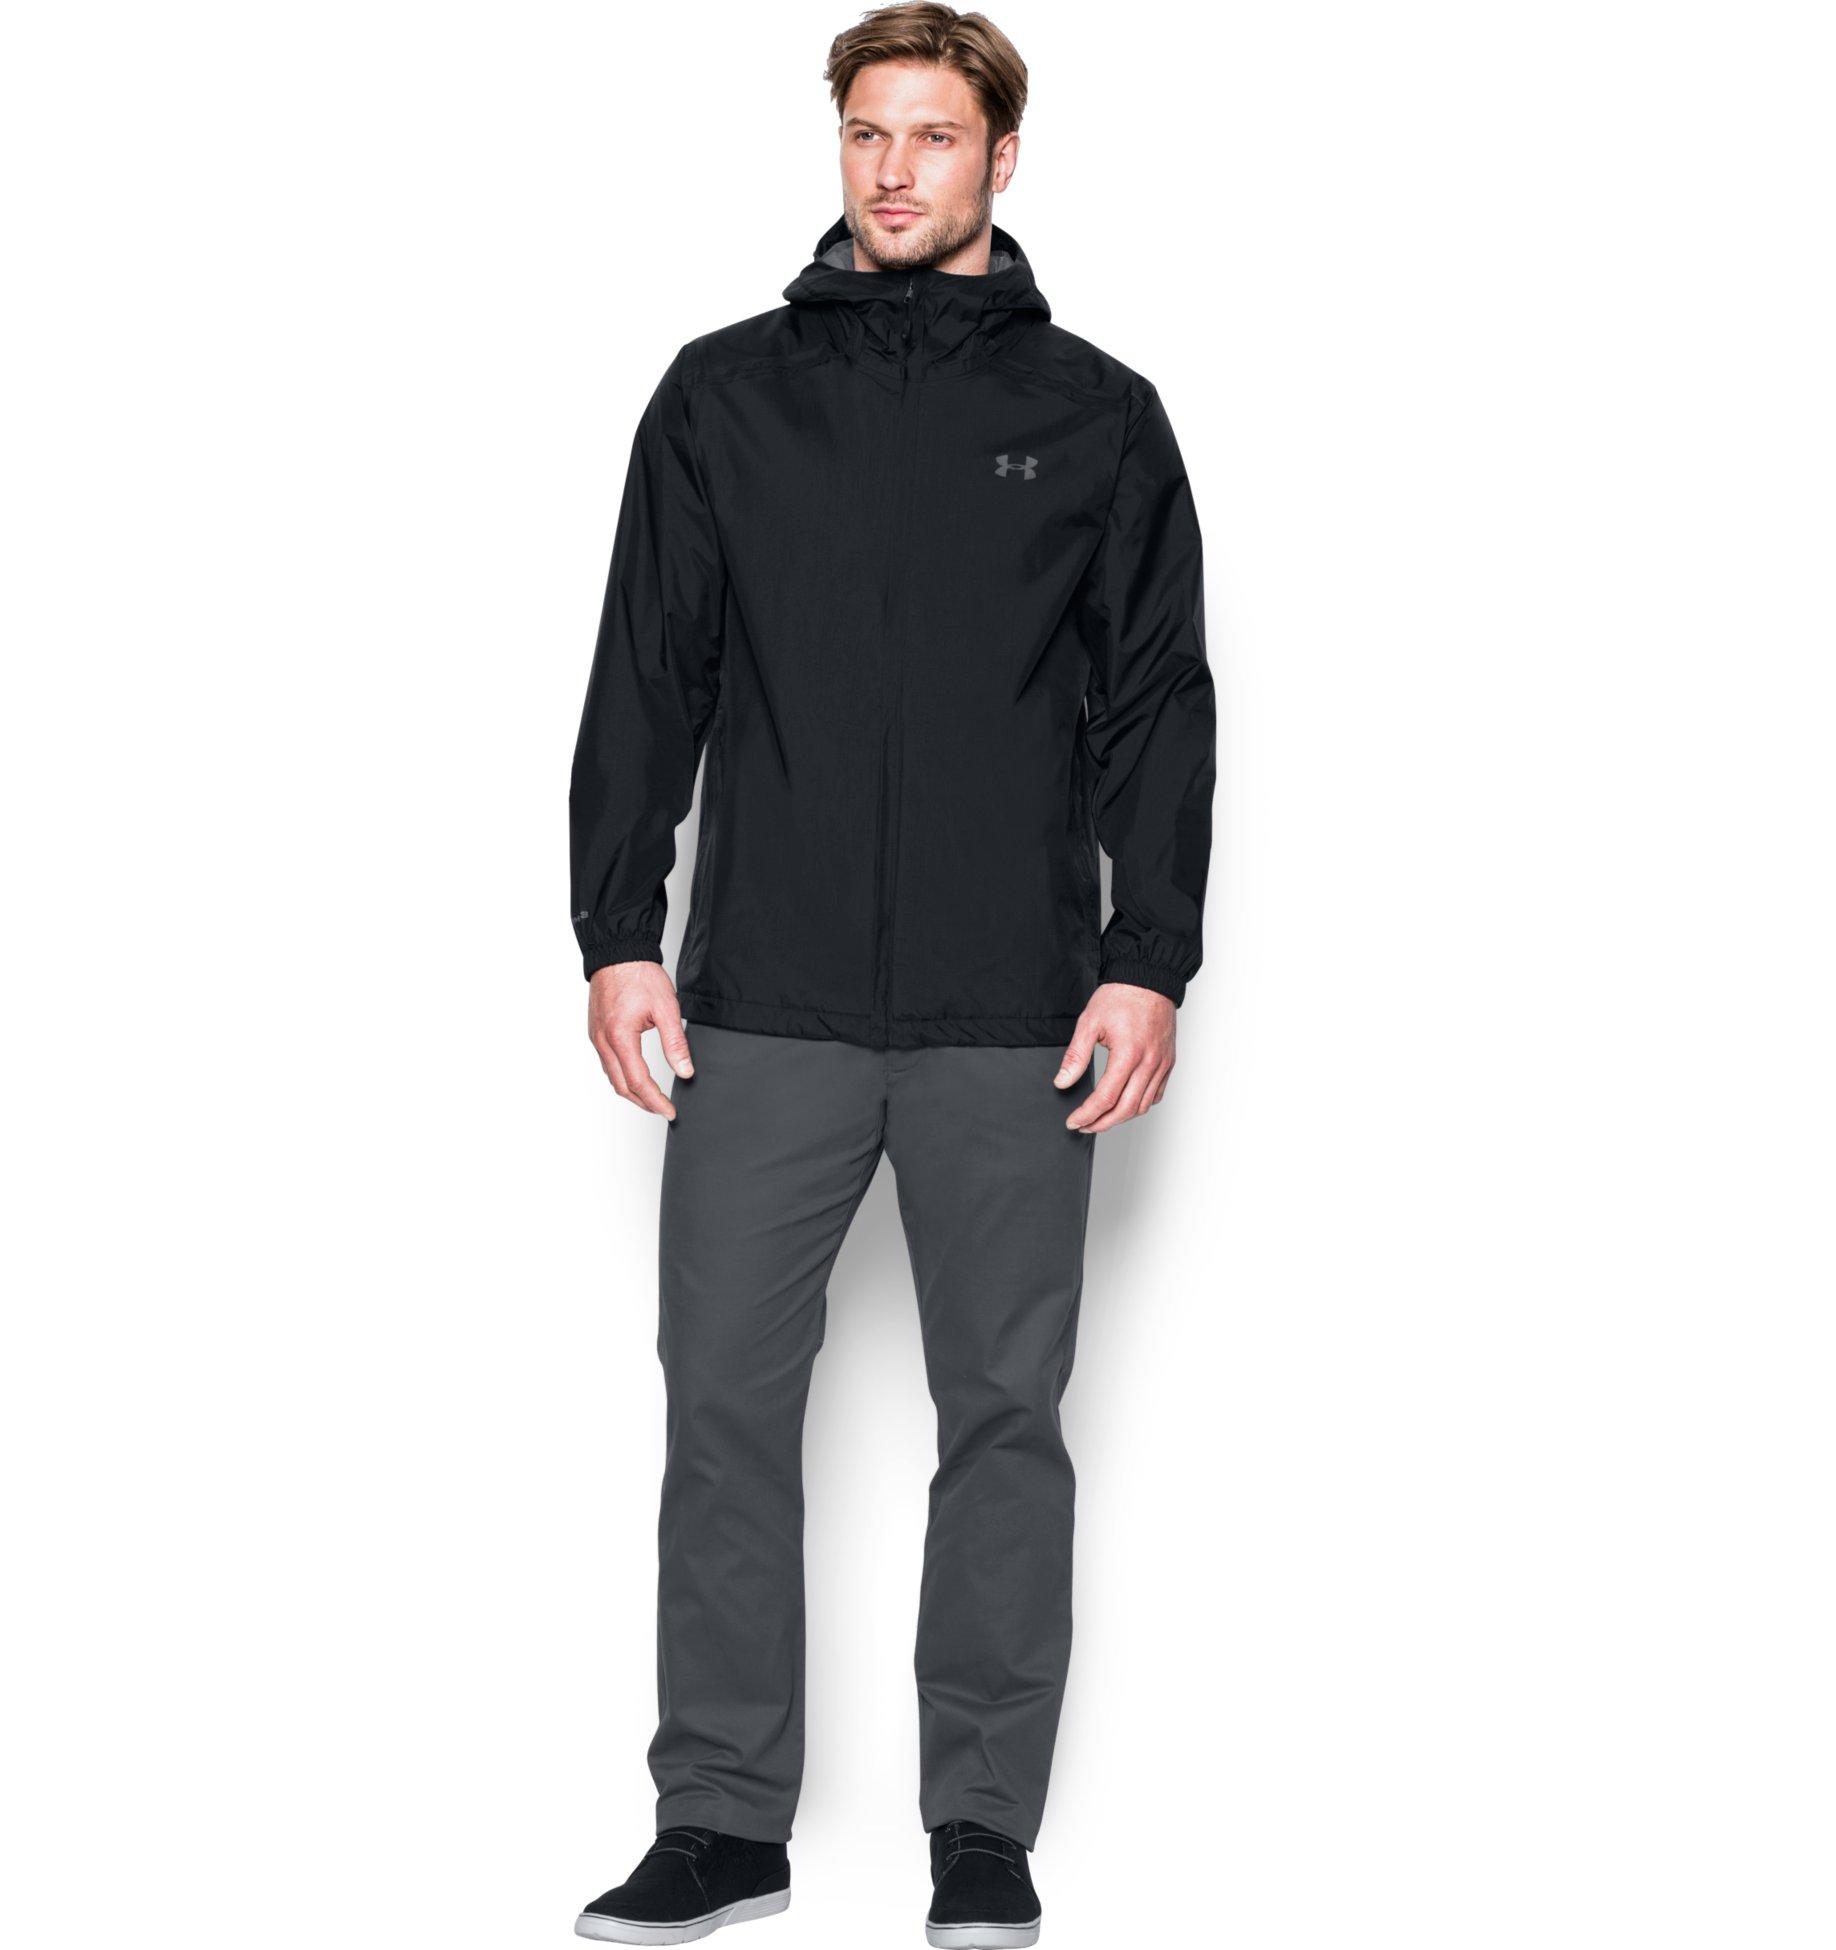 Under Armour Men's UA Storm Bora Jacket (Black/Graphite), S, XL: 2 for $75.59 ($37.79 each) + Free Shipping